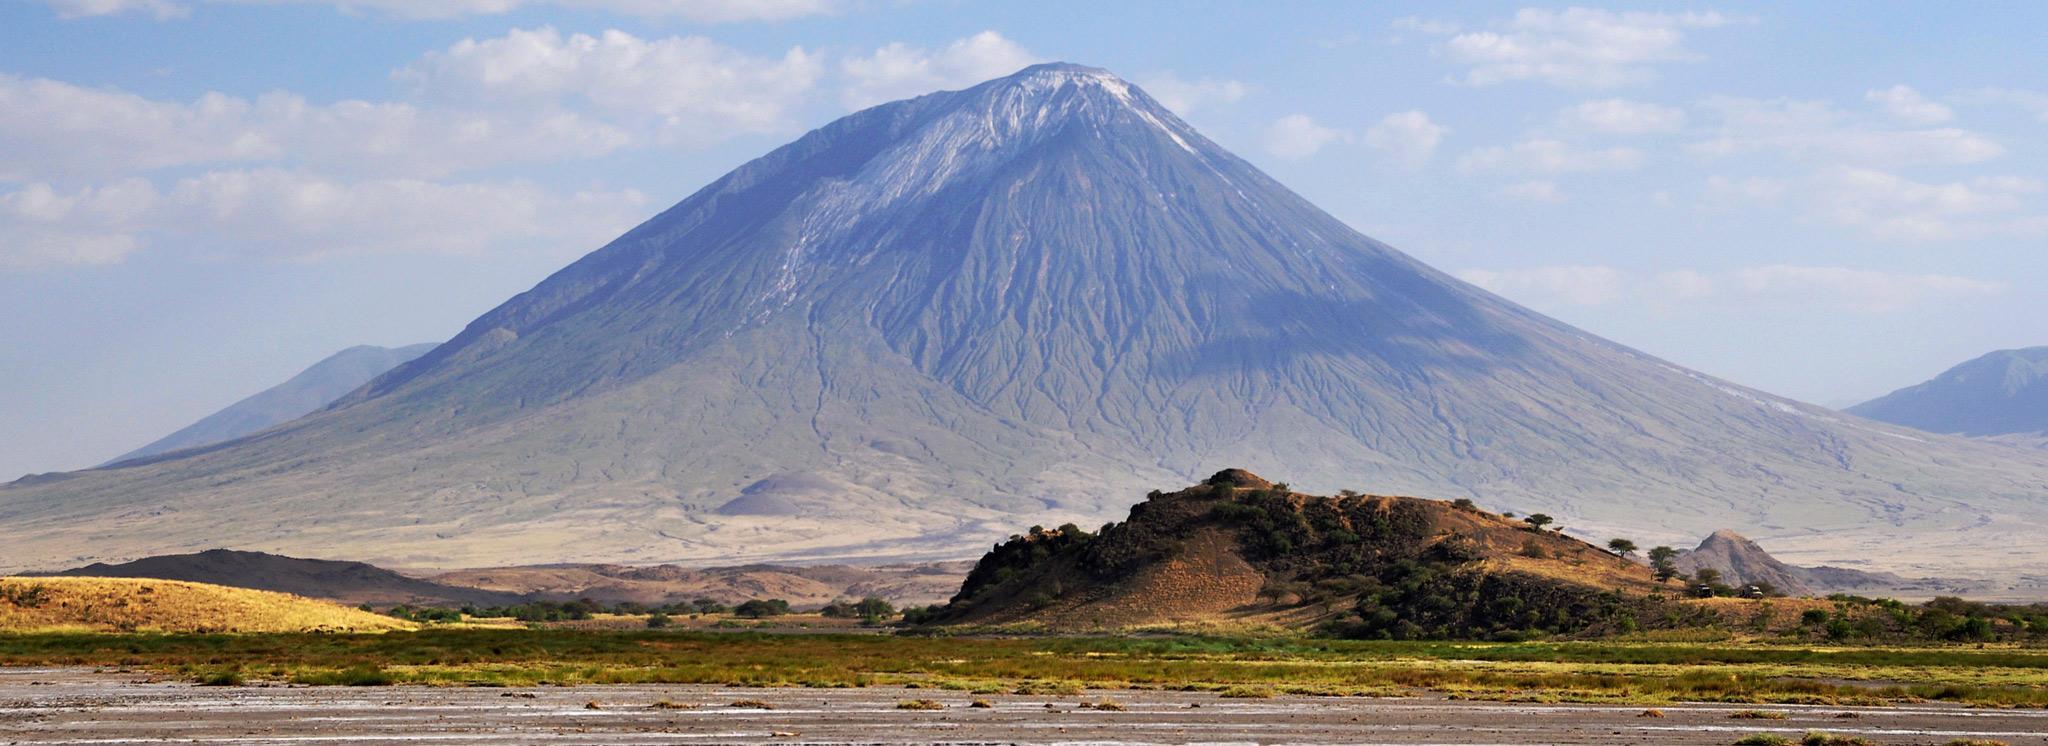 Ol Doinyo Lengai, the holy mountain of the Masai, in Tanzania